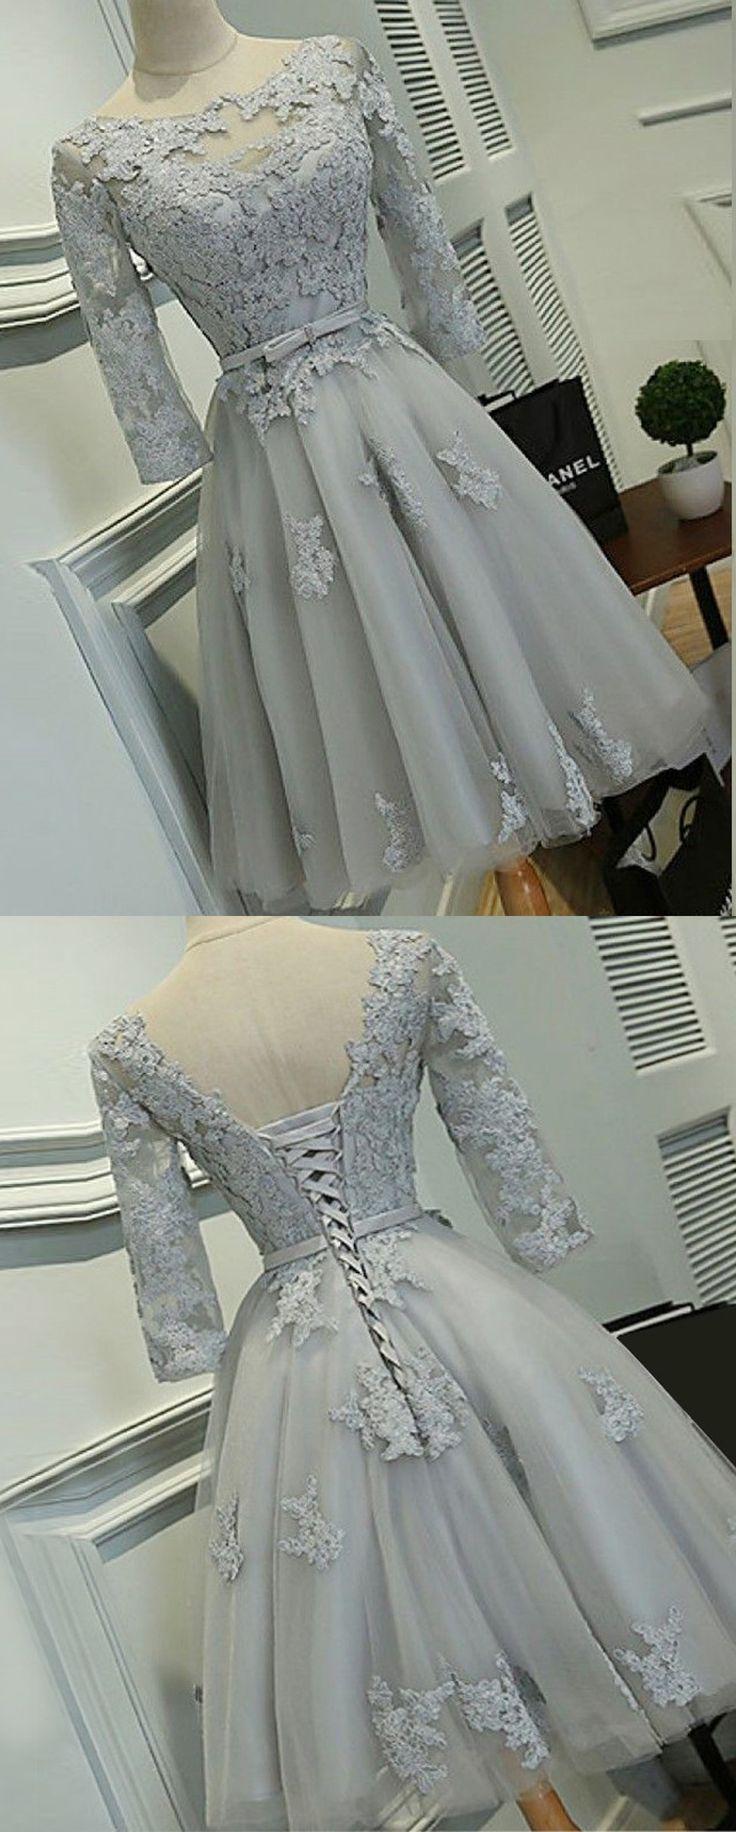 A-Line Dresses,Long Sleeves Dresses,Short Homecoming Dresses,Grey Dresses,Appliques Dresses